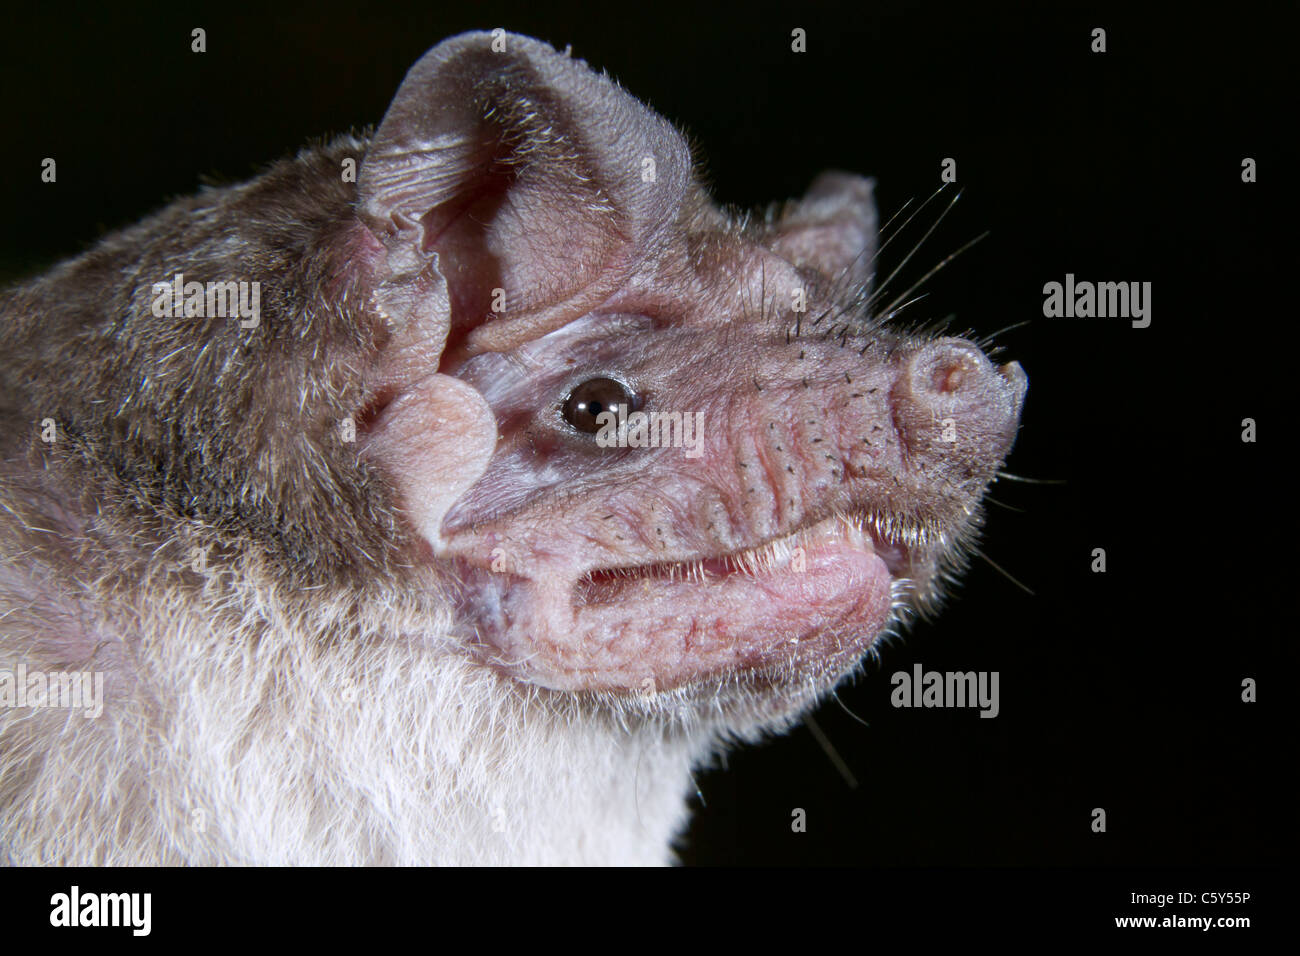 Angolan free-tailed bat (Mops condylurus) portrait, DR Congo. - Stock Image